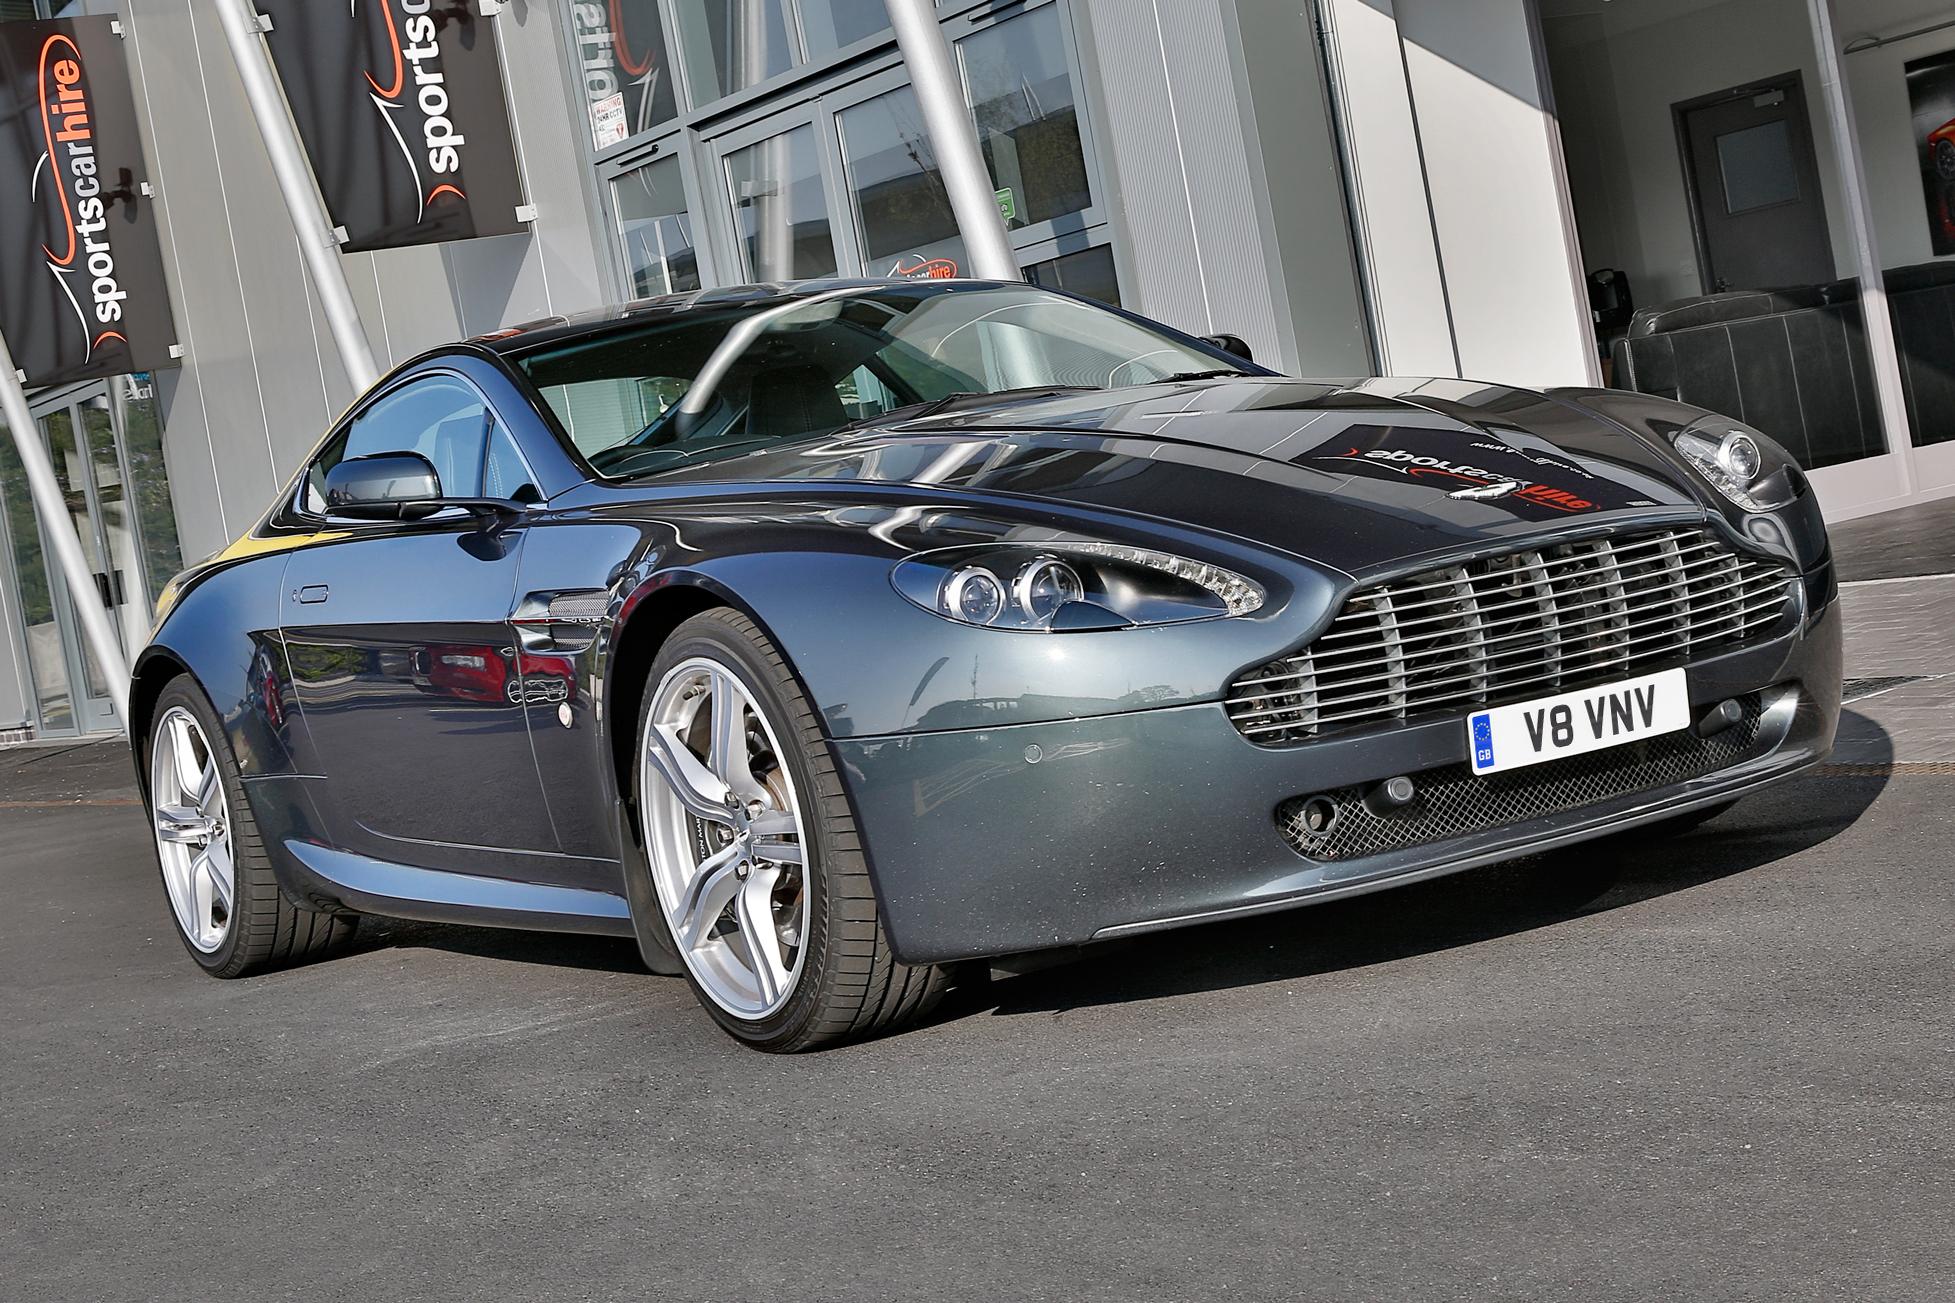 Aston Martin Vantage 4.7 hire from Sportshire, Midlands